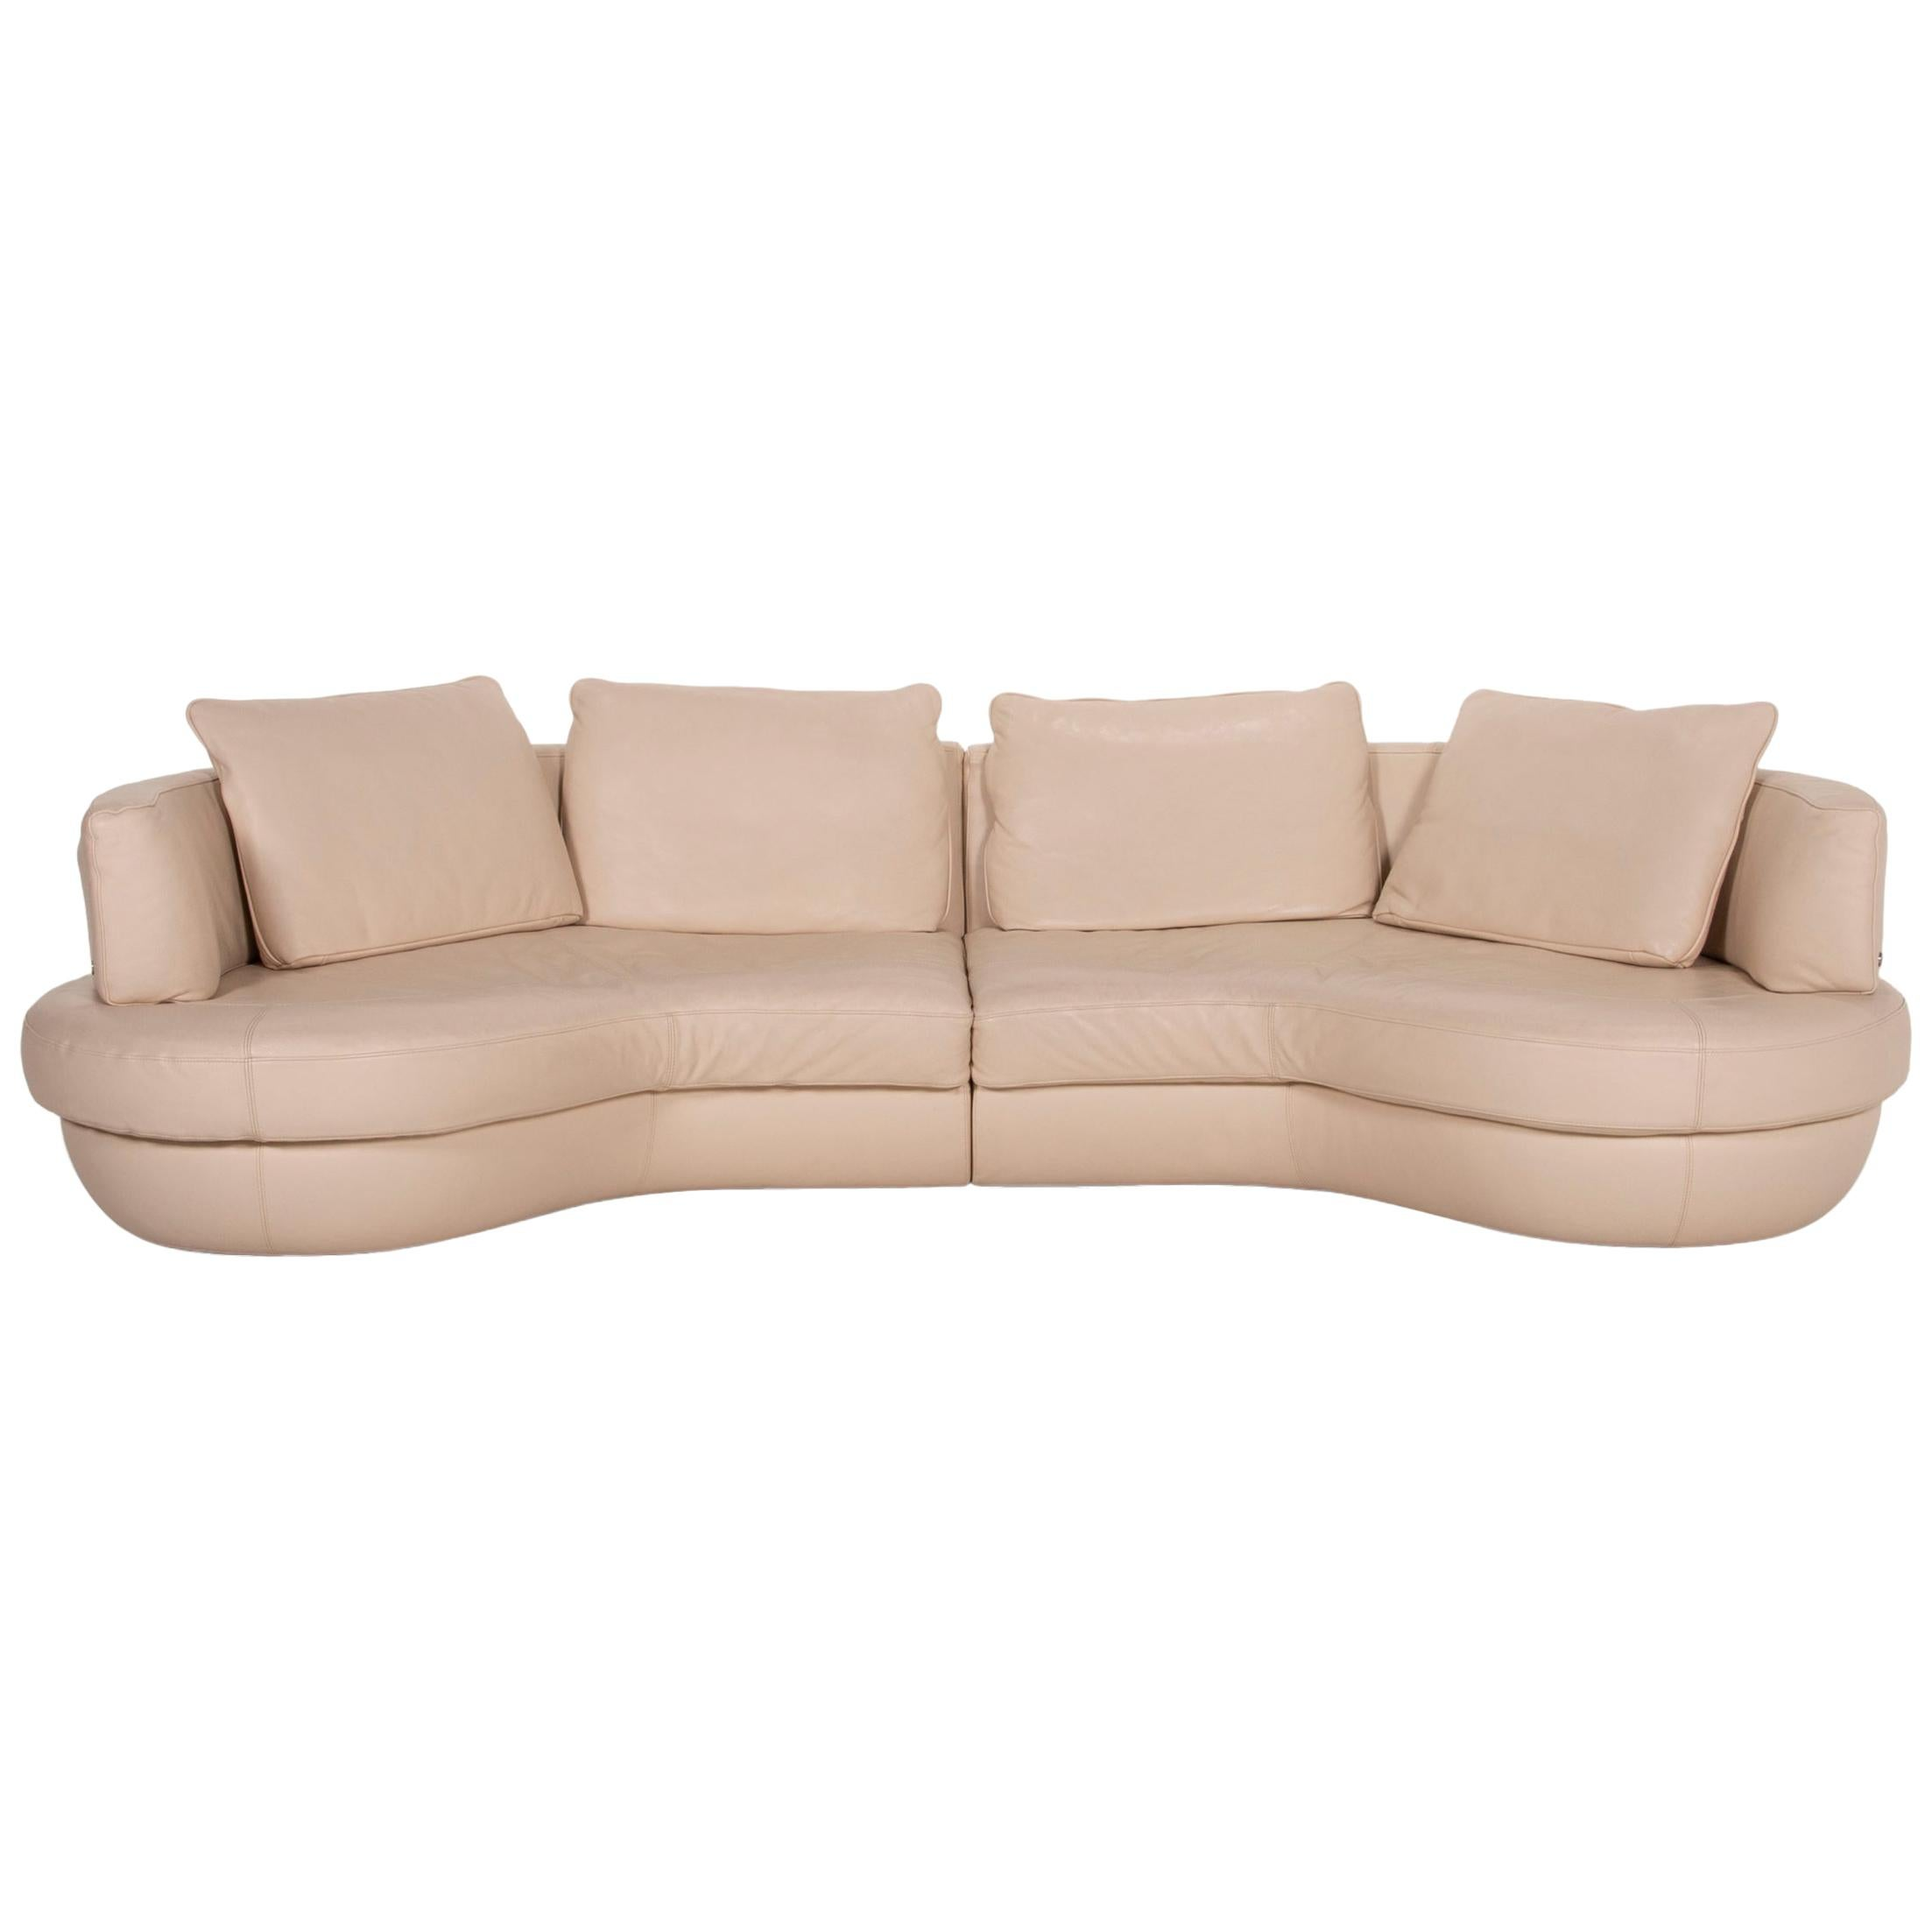 Natuzzi Leather Corner Sofa Cream Function Sofa Couch